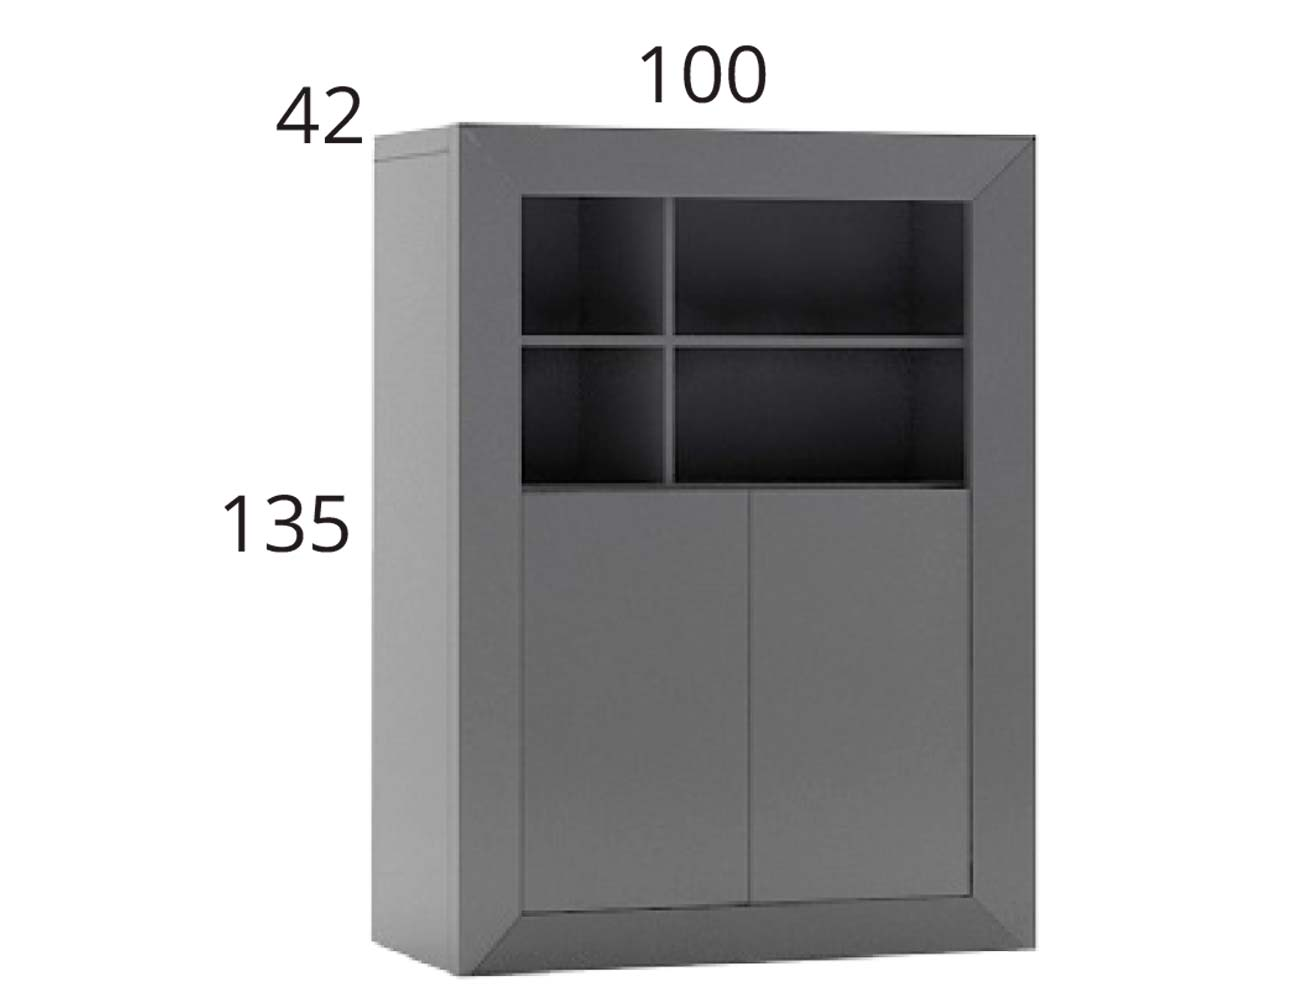 A0551